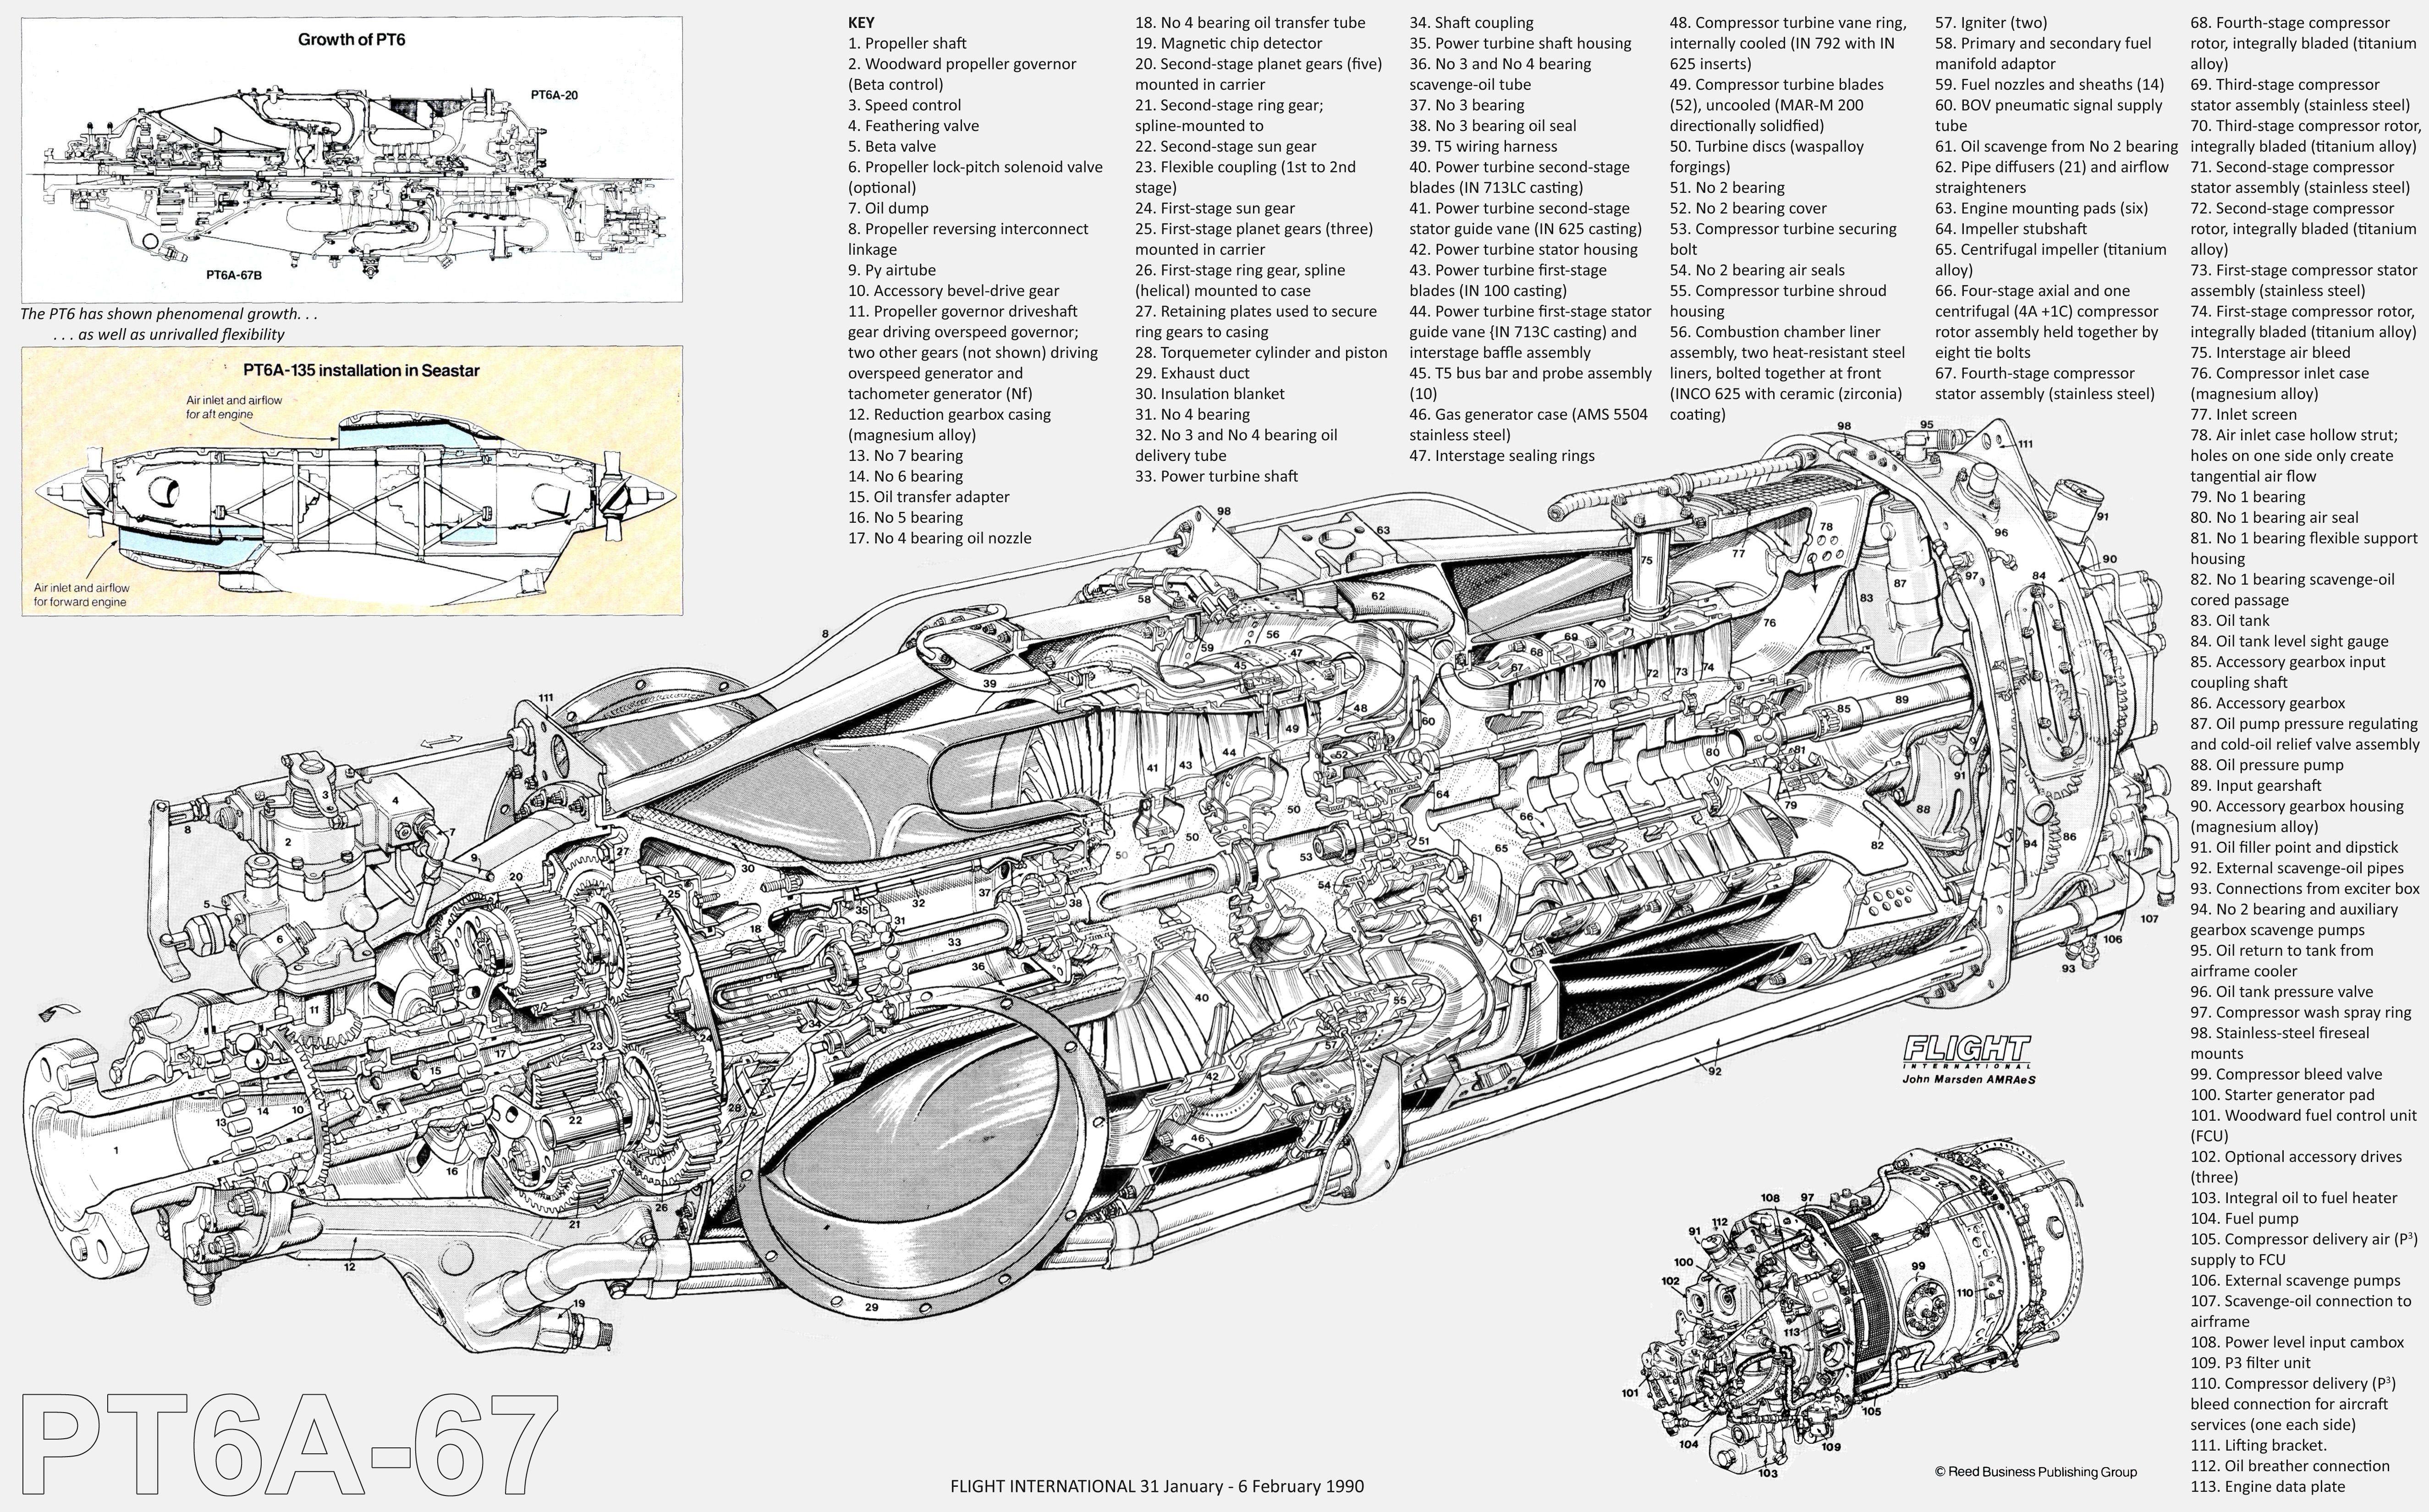 PC12 Pratt & Whitney Canada PT6A67 turboprop cutaway